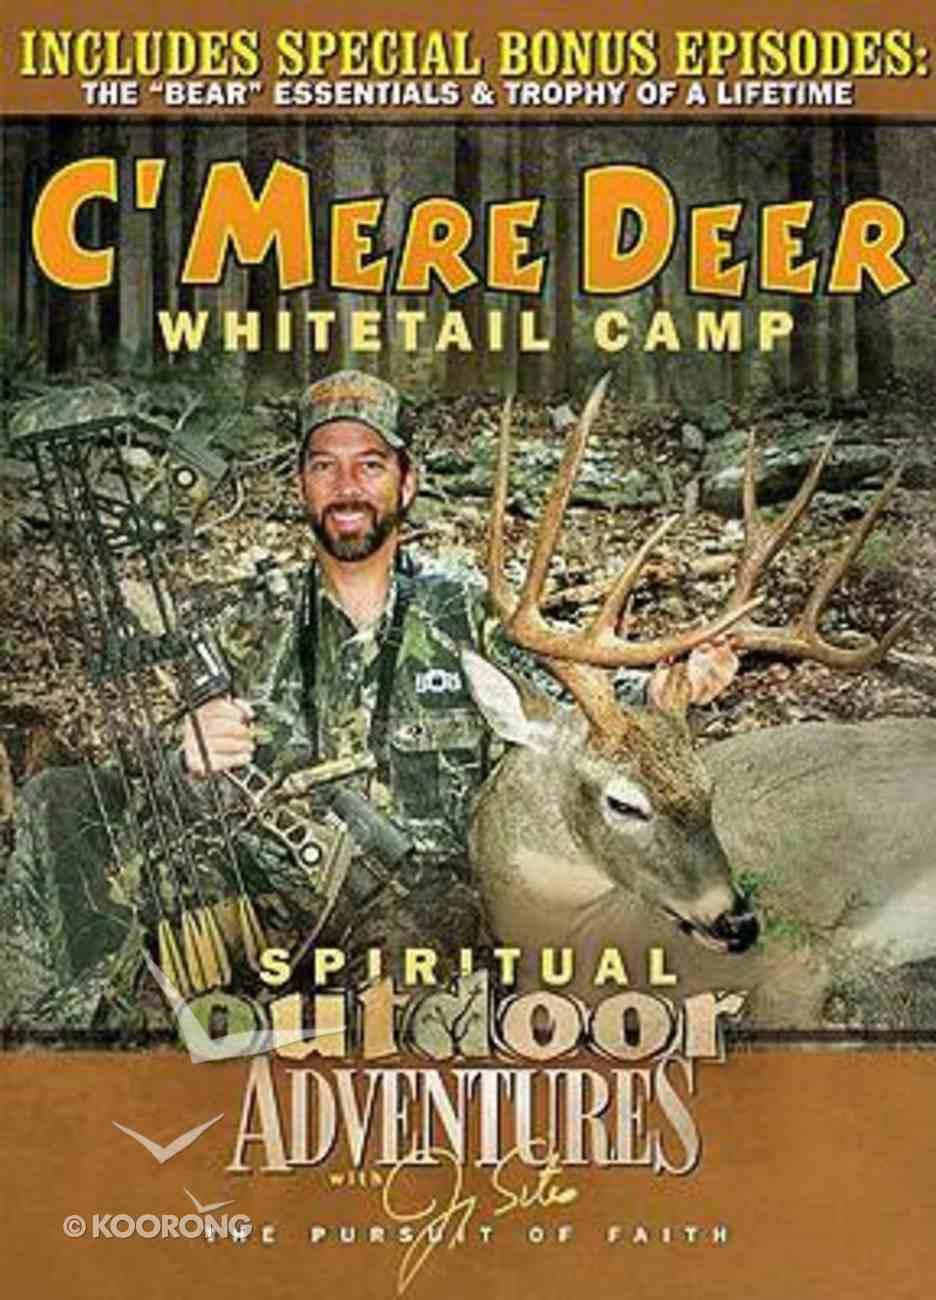 C'mere Deer Whitetail Camp (Spiritual Outdoor Adventure Series) DVD